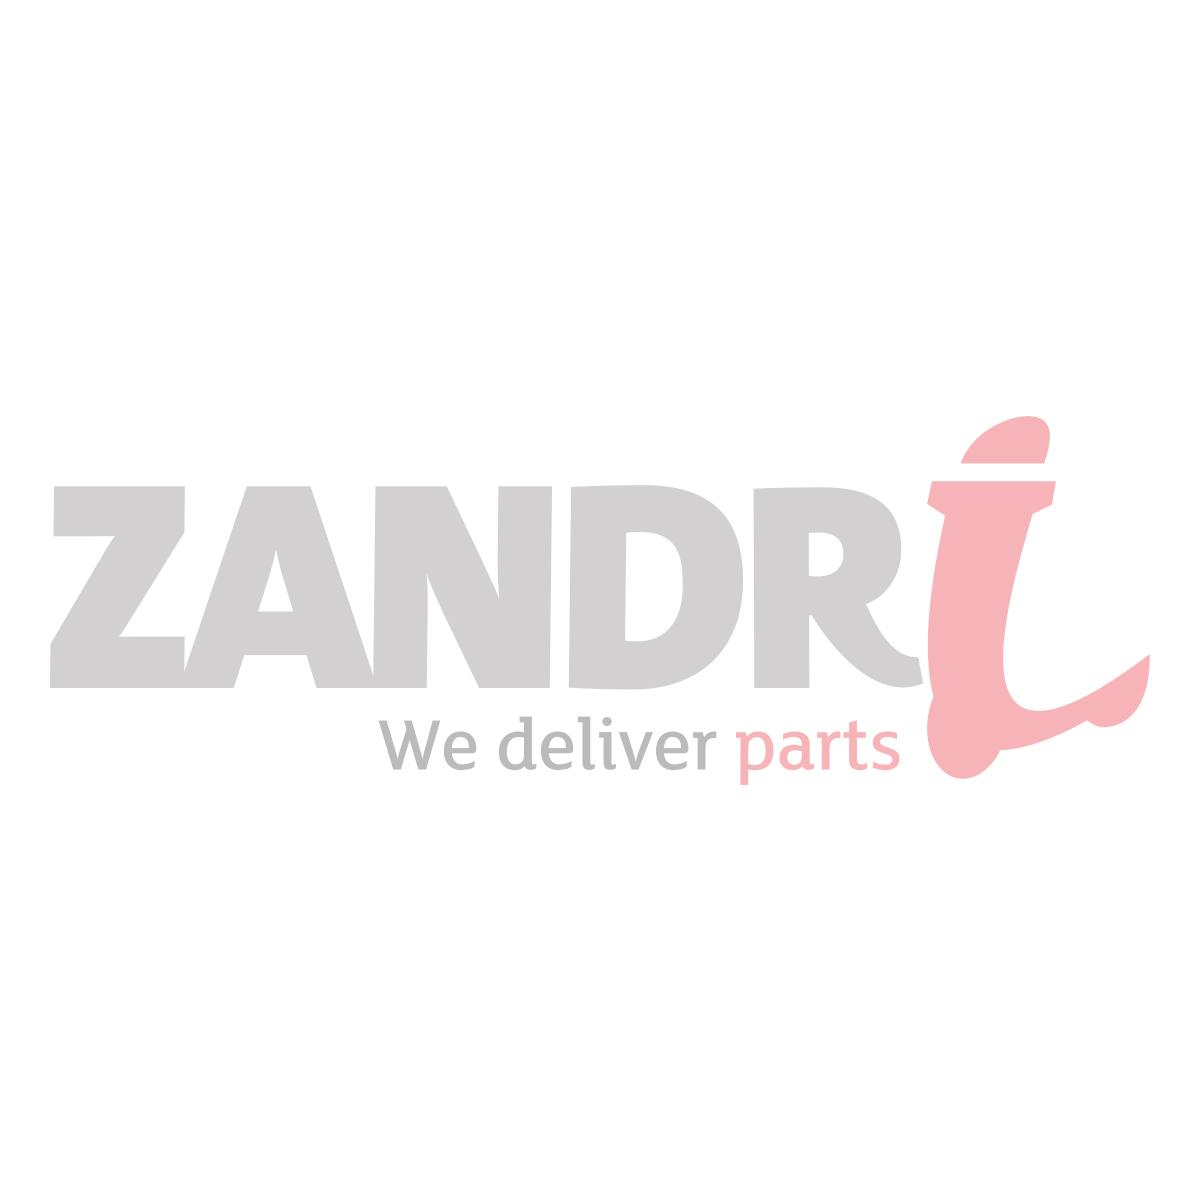 Buddy / Zadelslot Compleet Generic Xor